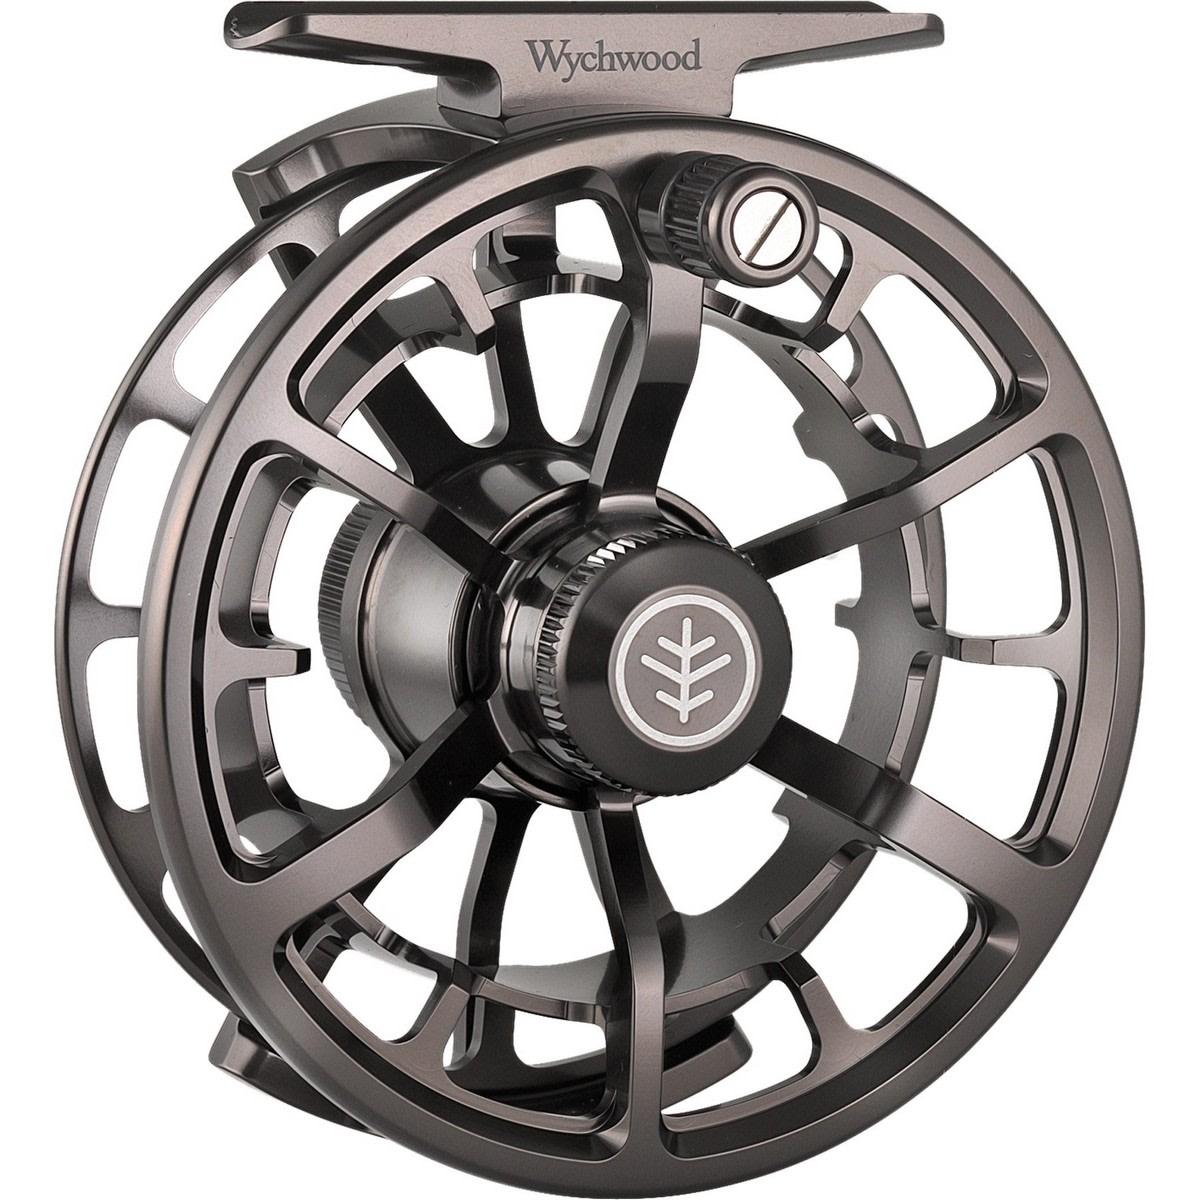 Náhradní cívka Wychwood RS2 Spare Spool 3/4 Weight